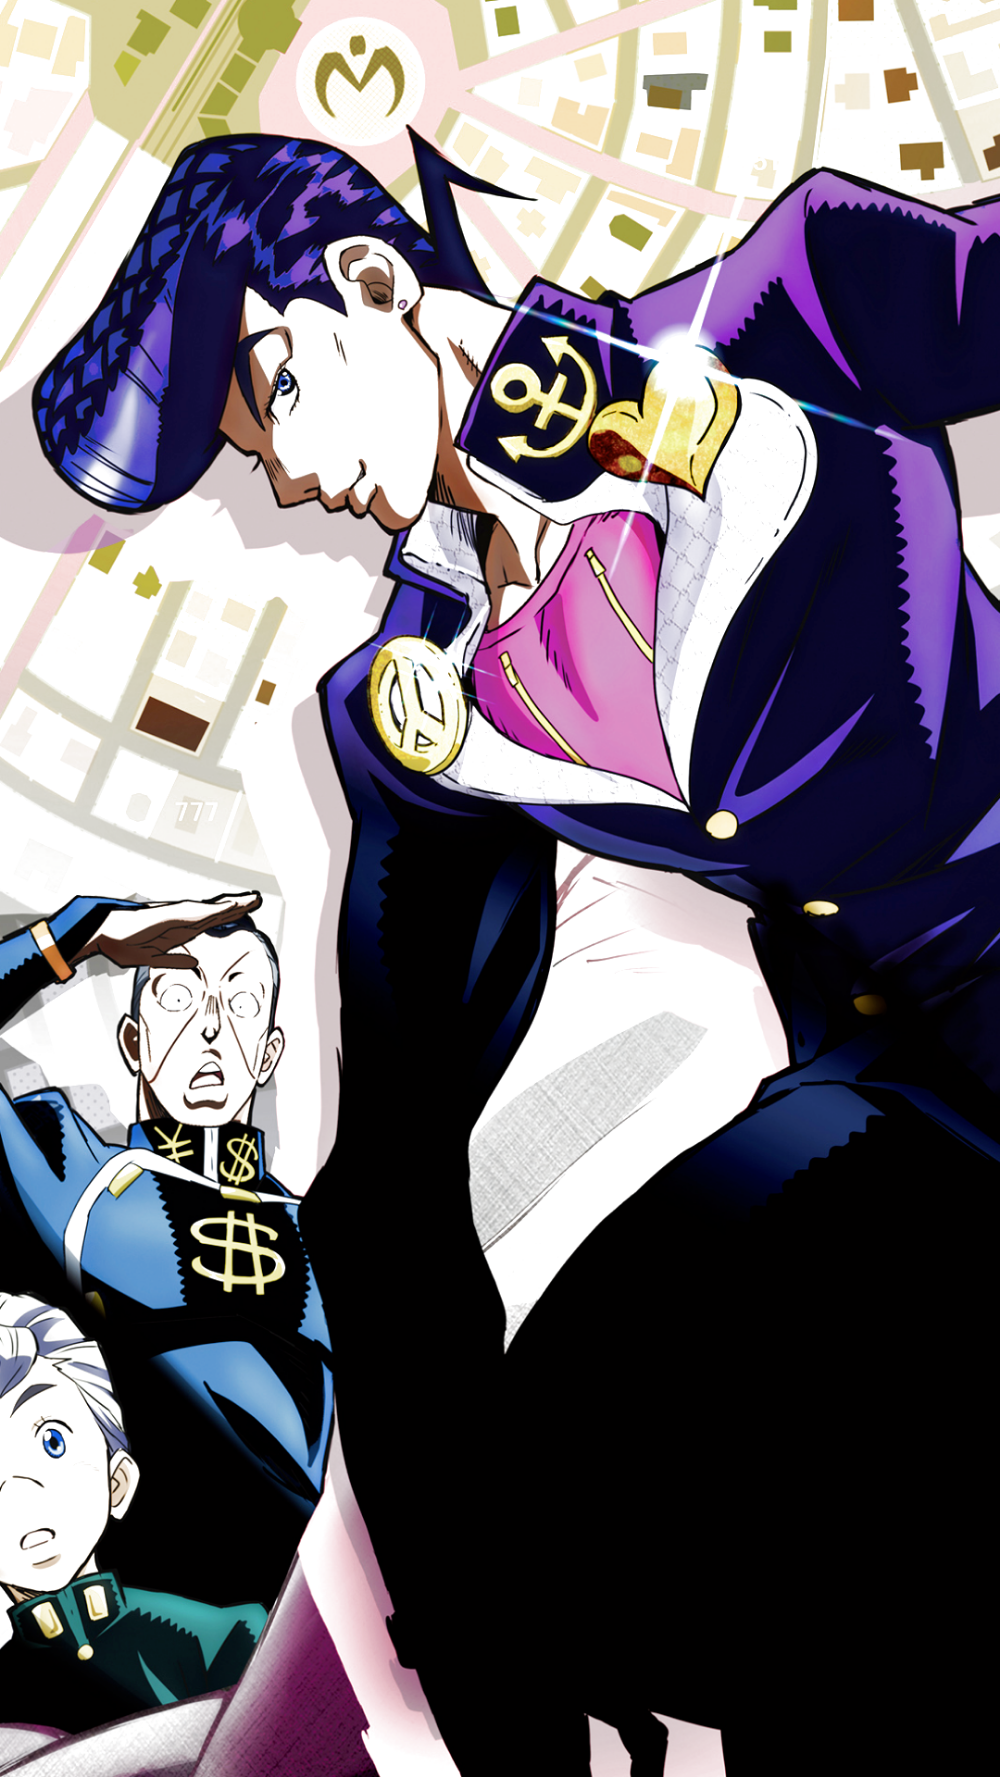 Download this Wallpaper Anime/Jojo's Bizarre Adventure